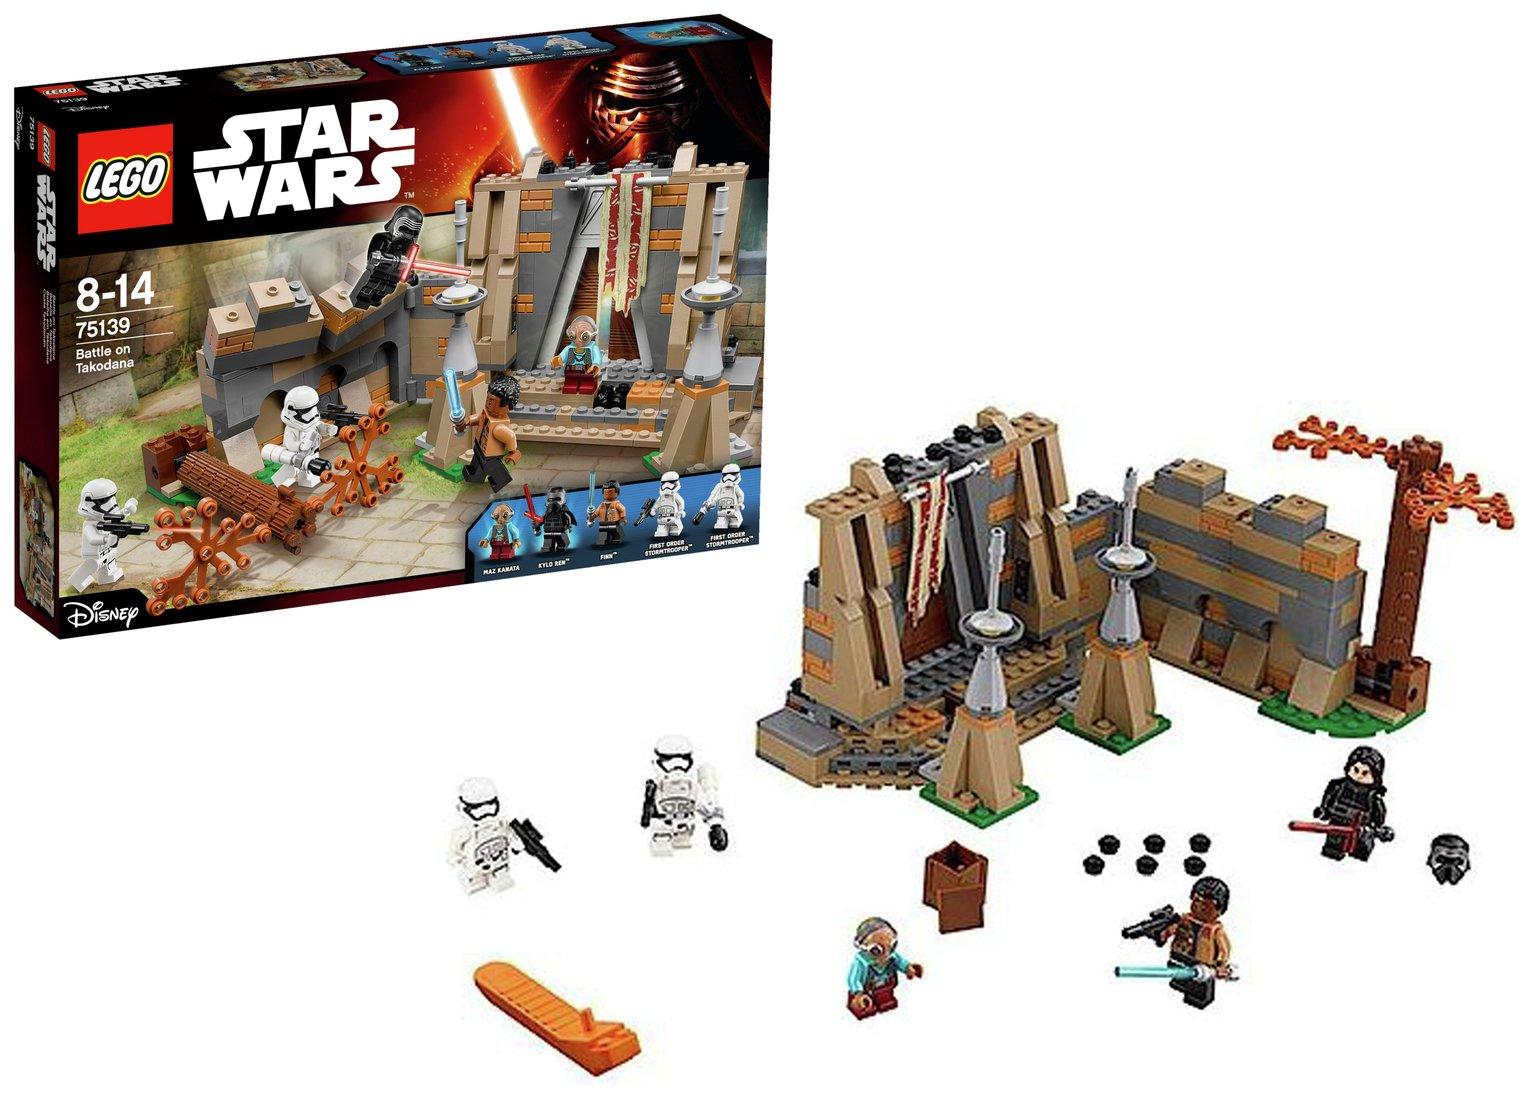 LEGO Star Wars Battle on Takodana - 75139.